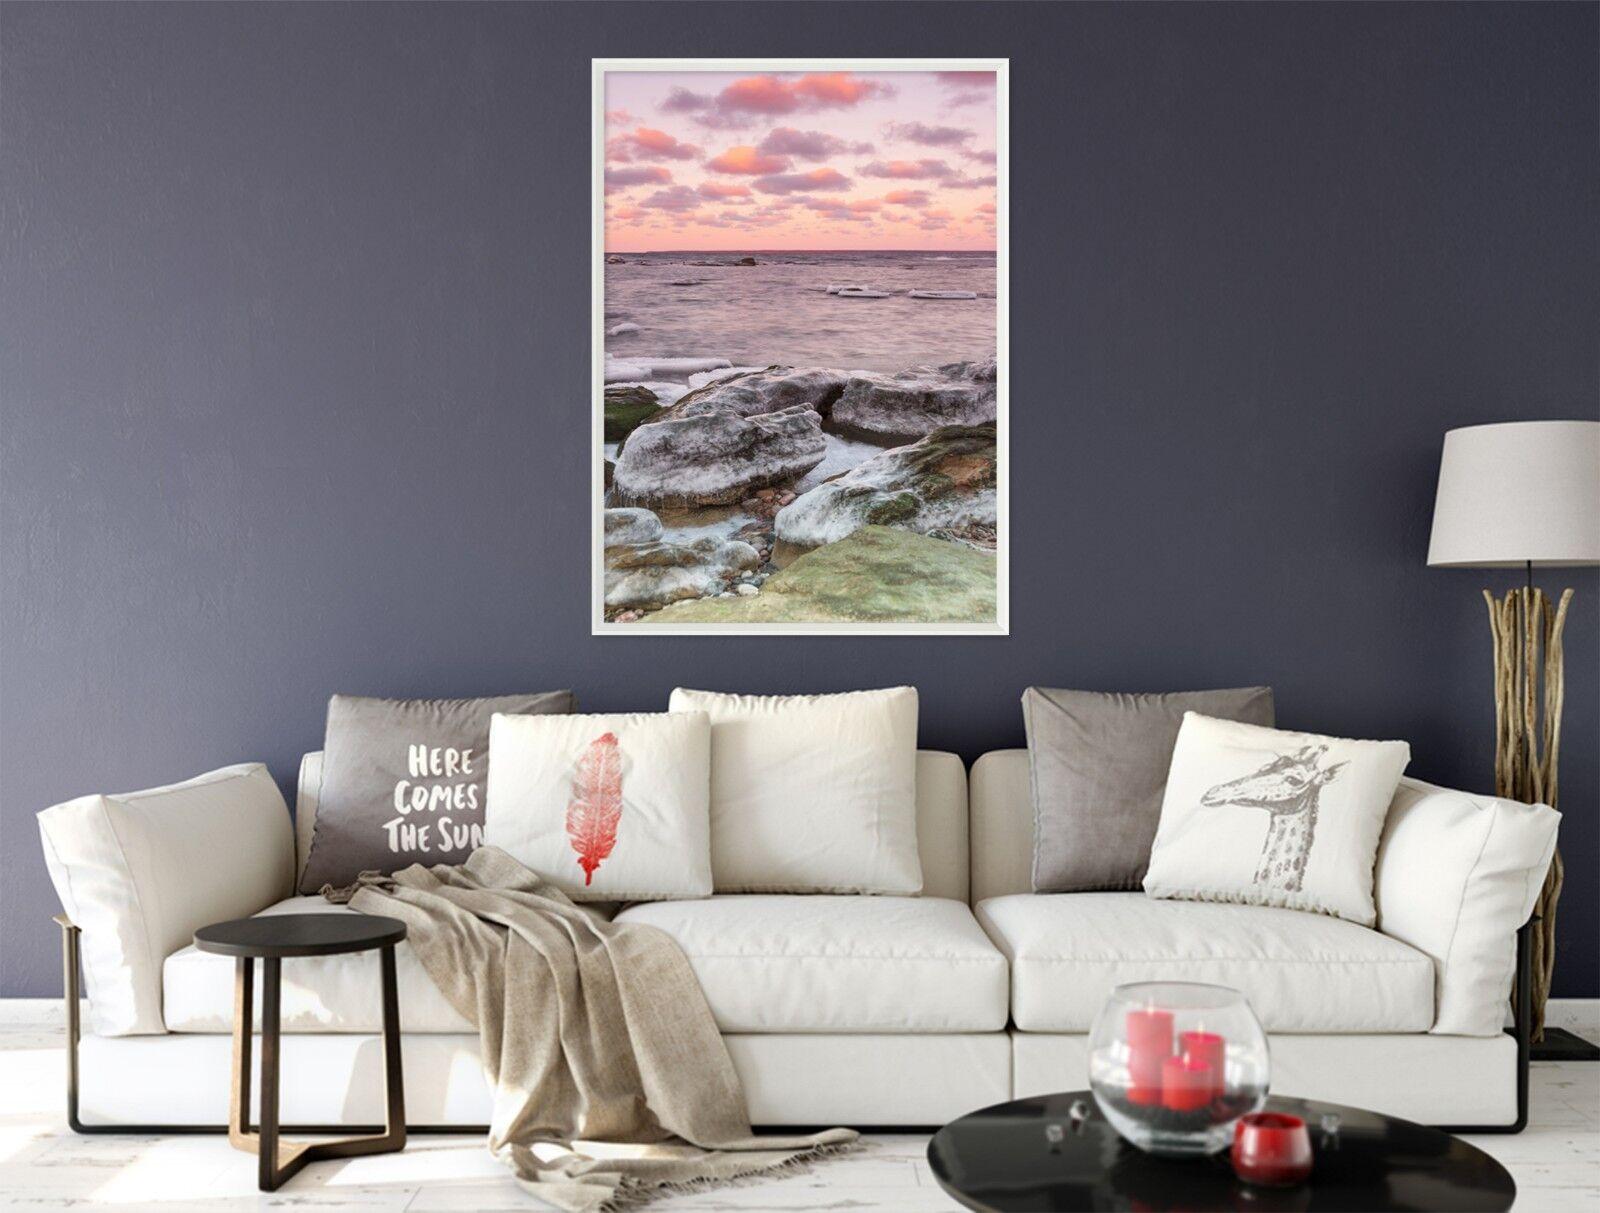 3D Haiping Line 6 Framed Poster Home Decor Print Painting Art AJ AU